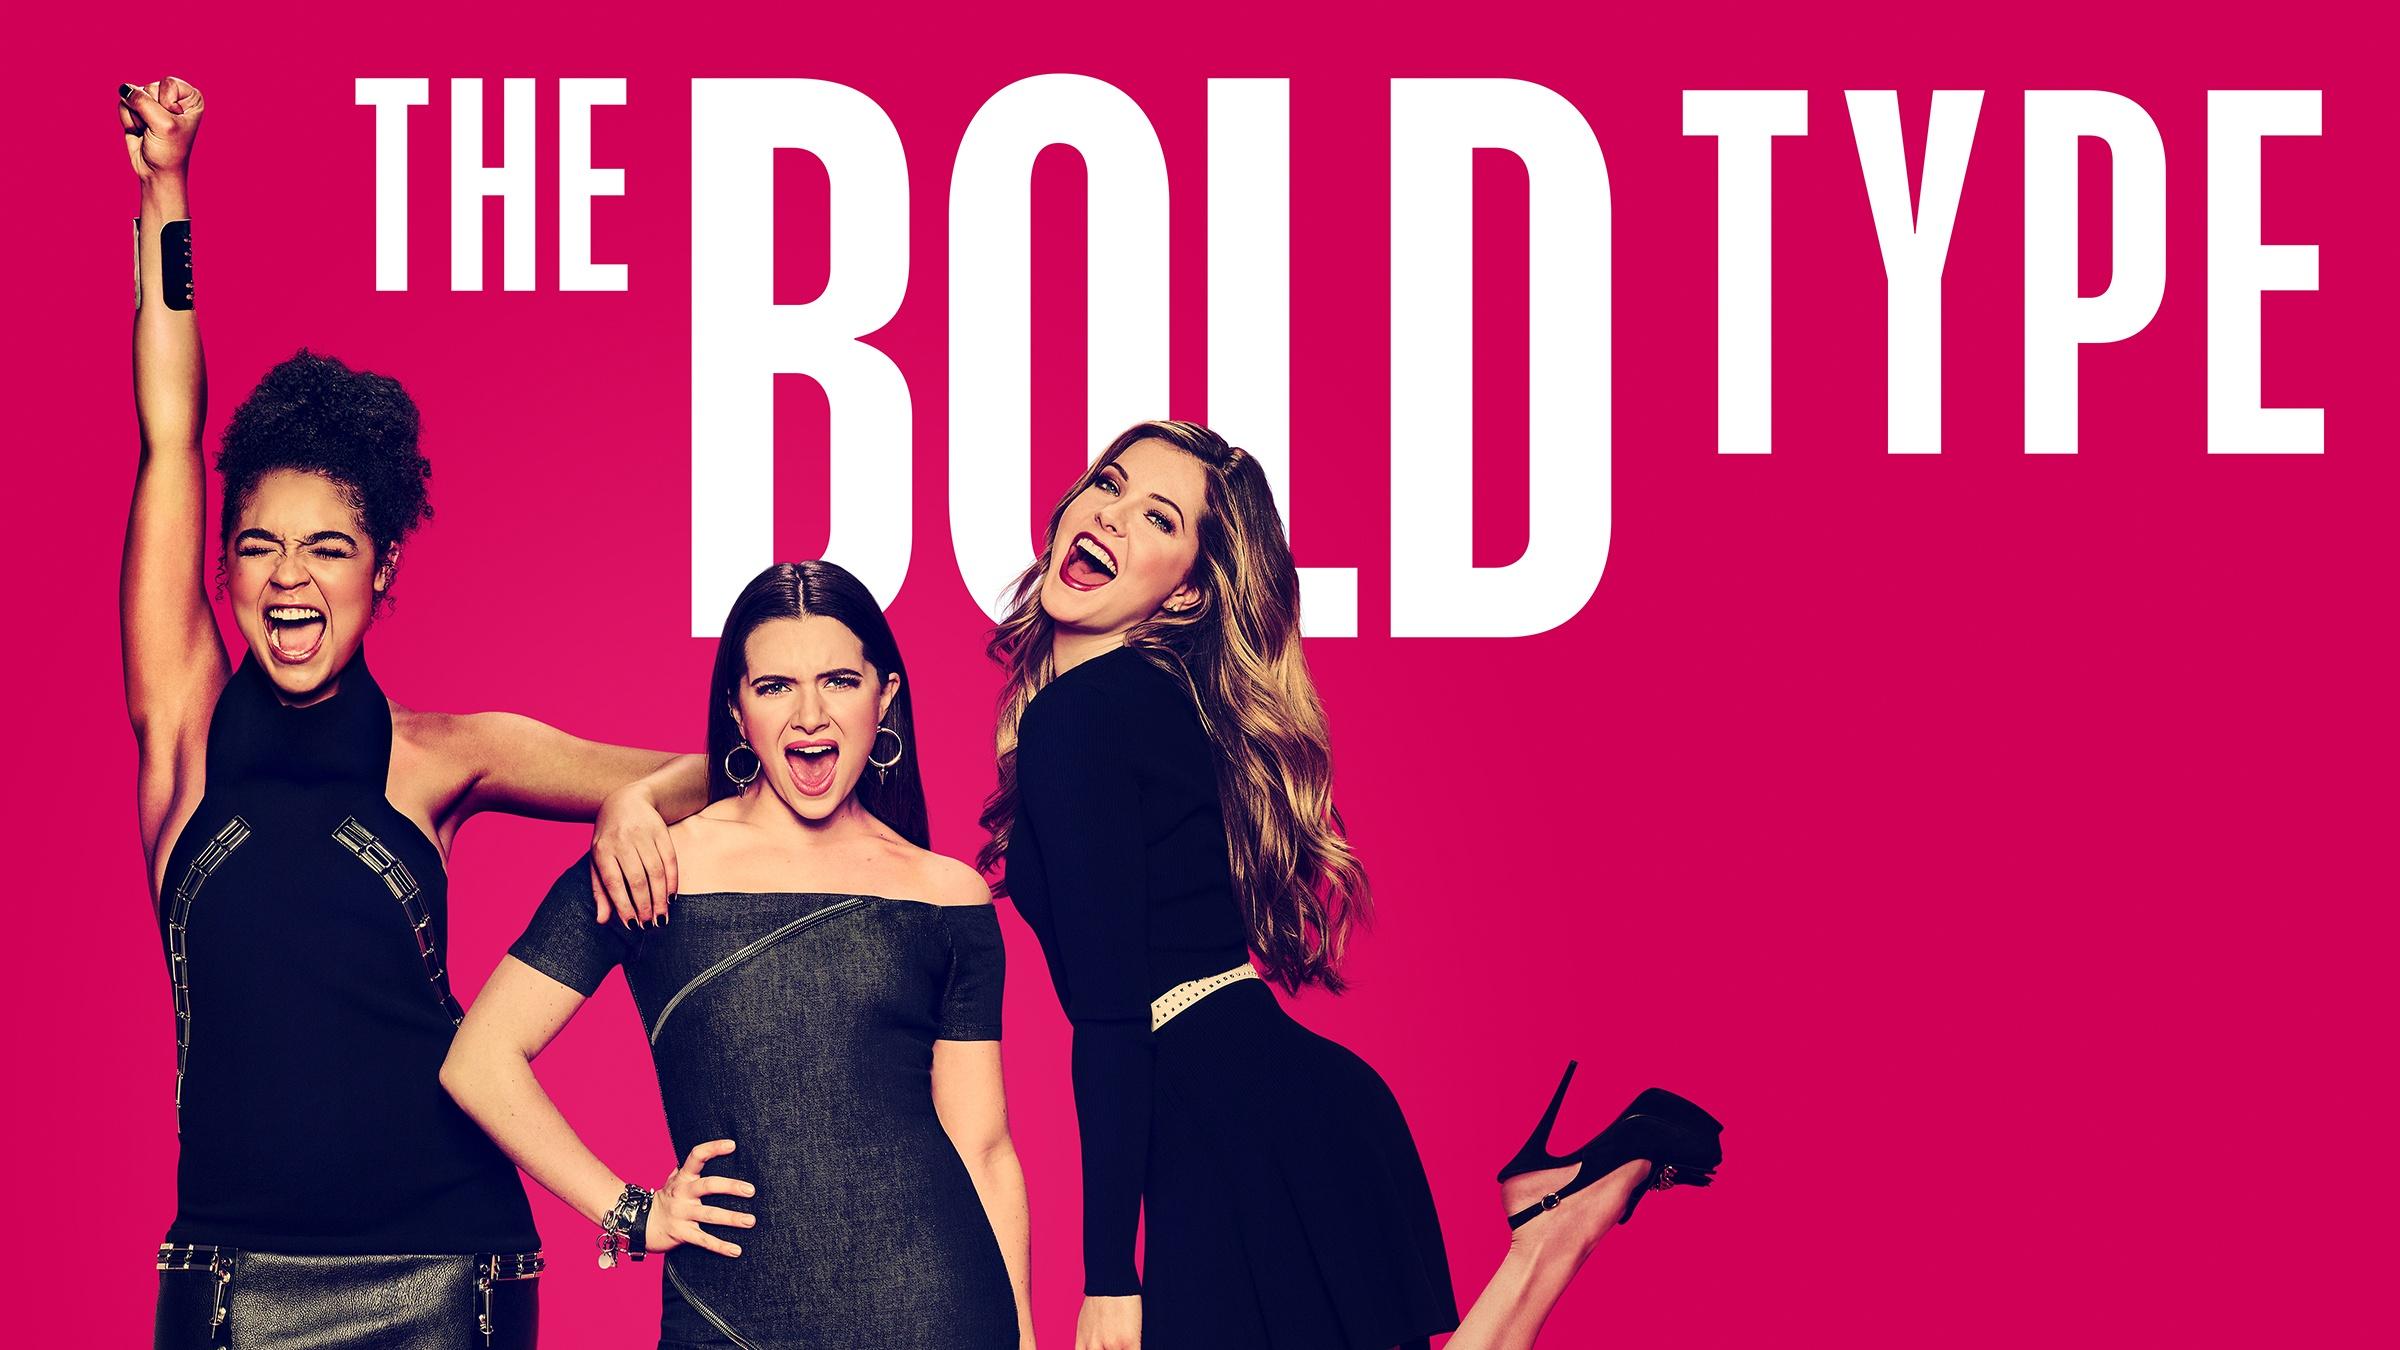 The Bold Type, NBC Universal